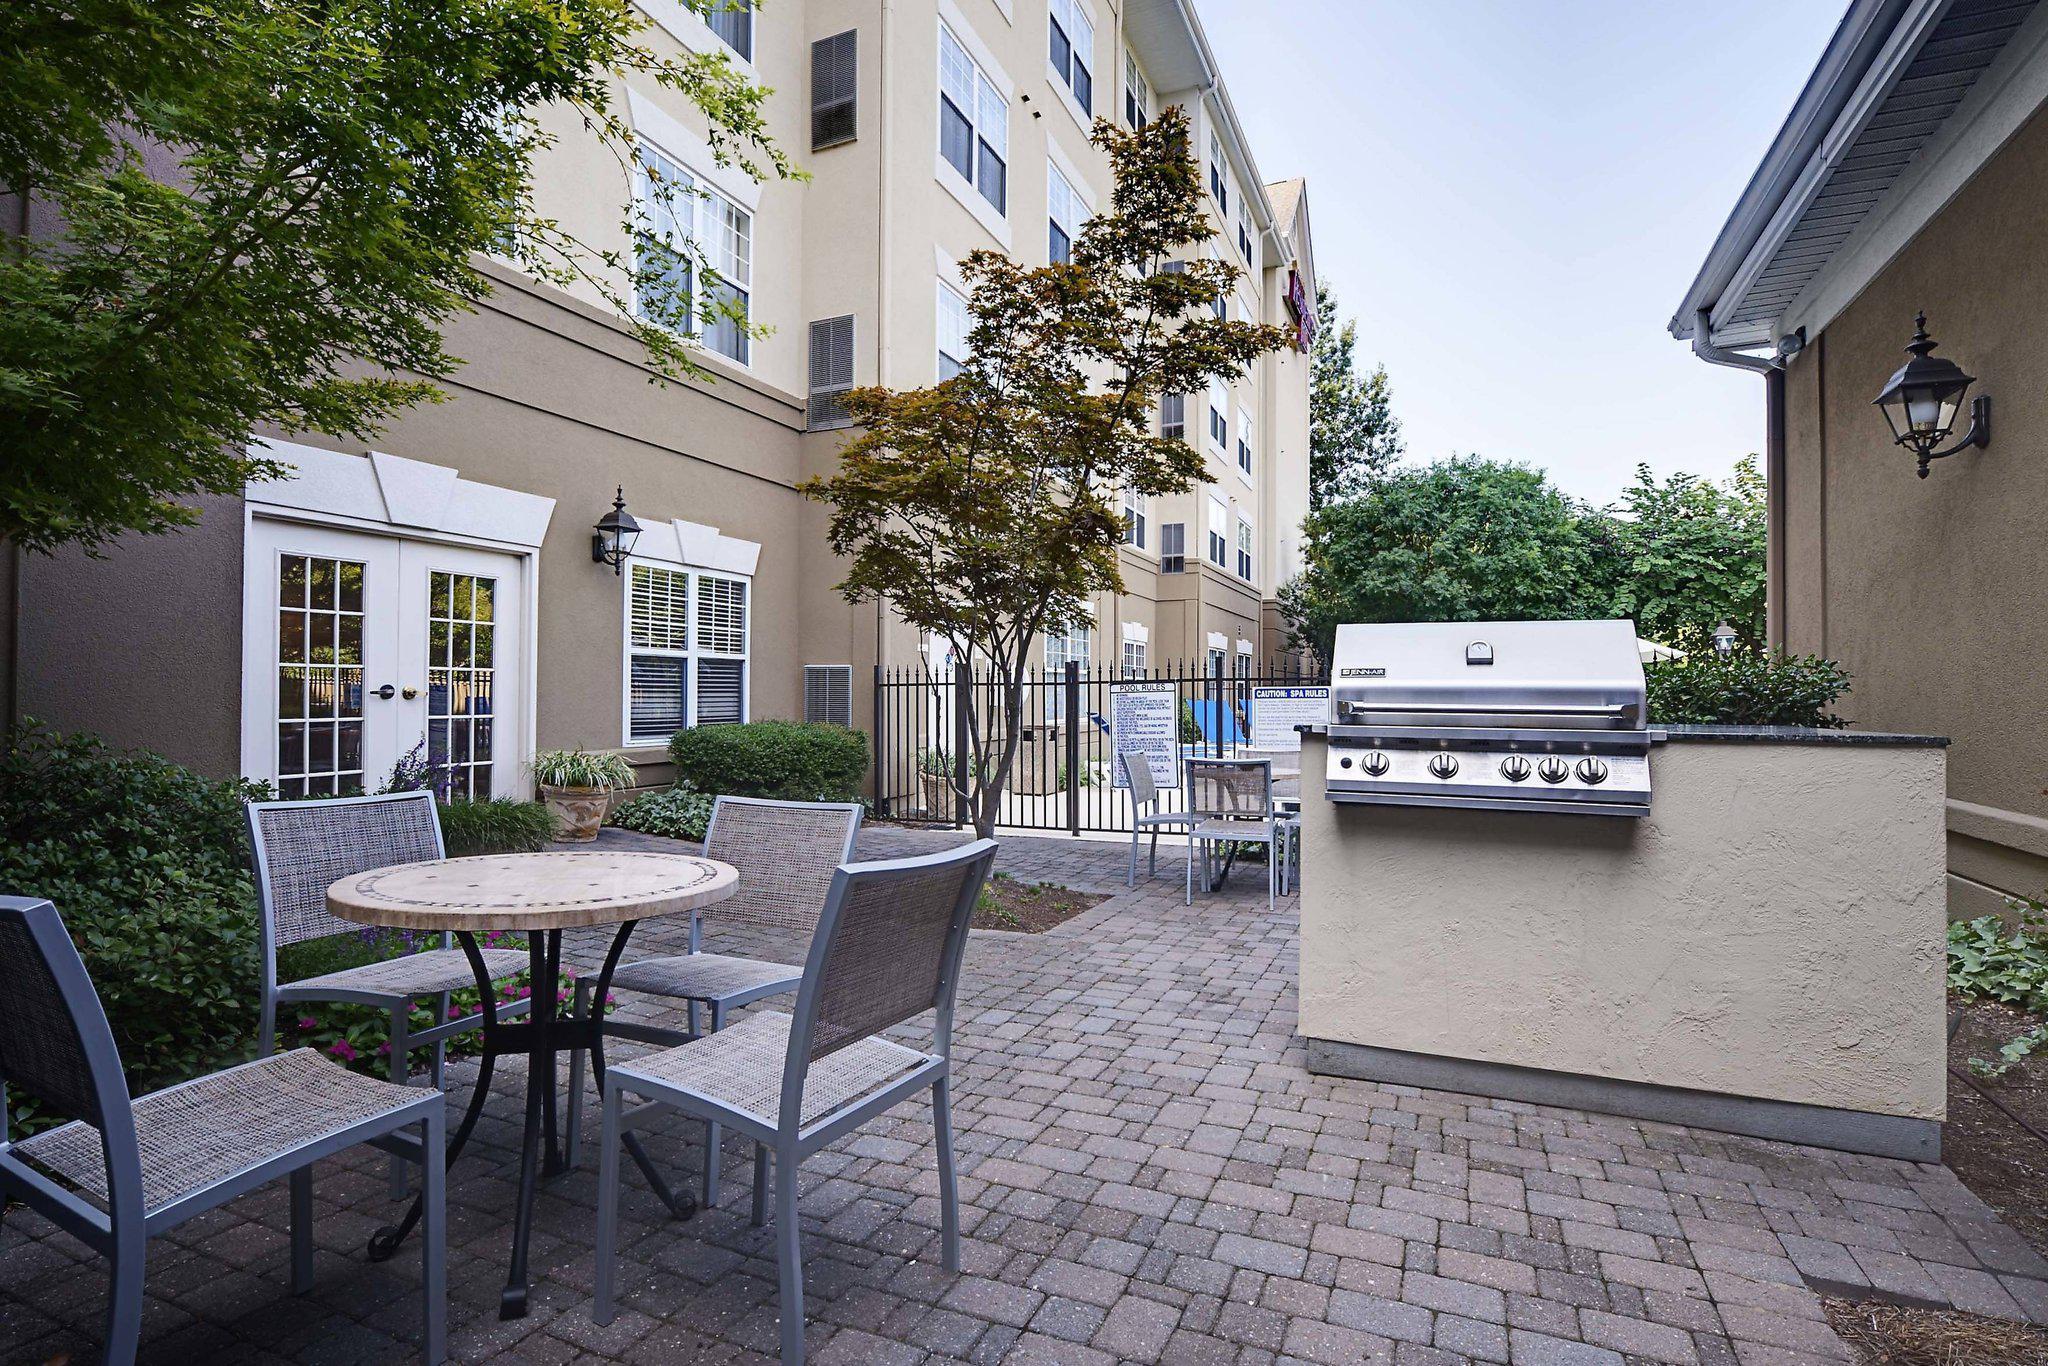 Residence Inn by Marriott Raleigh Crabtree Valley